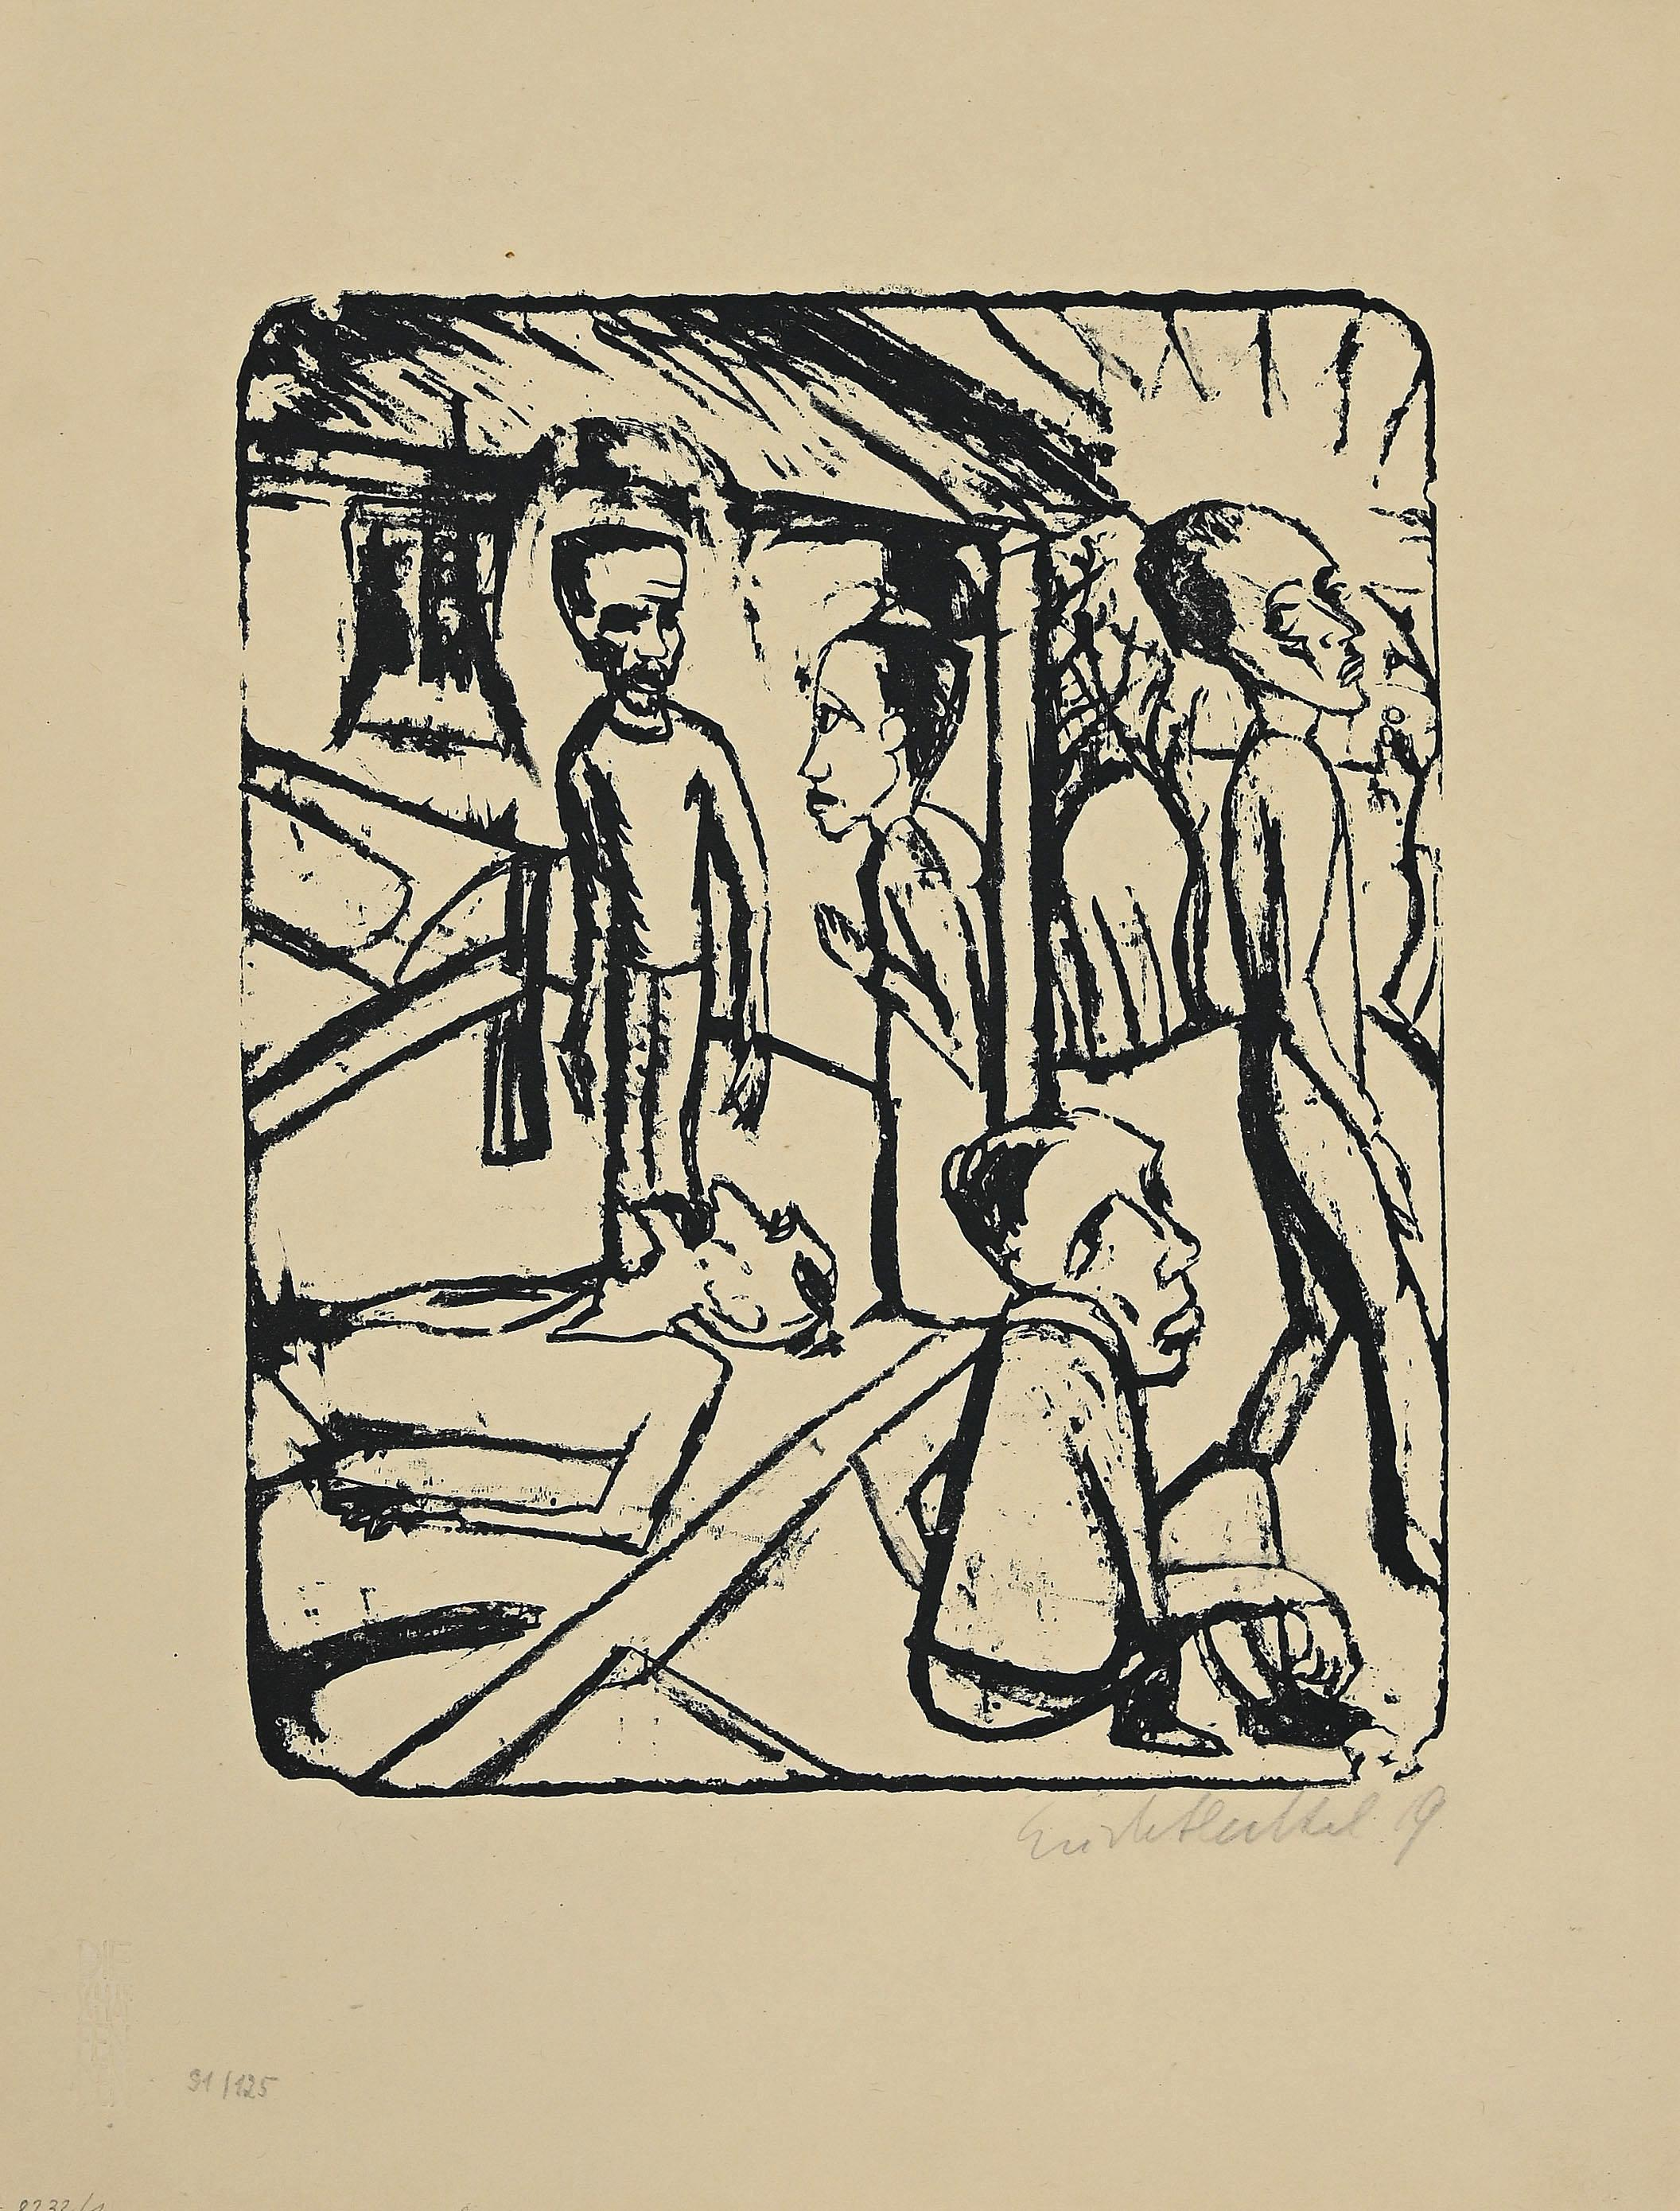 The Brothers Karamazov - Original Lithograph by E. Heckel - 1919